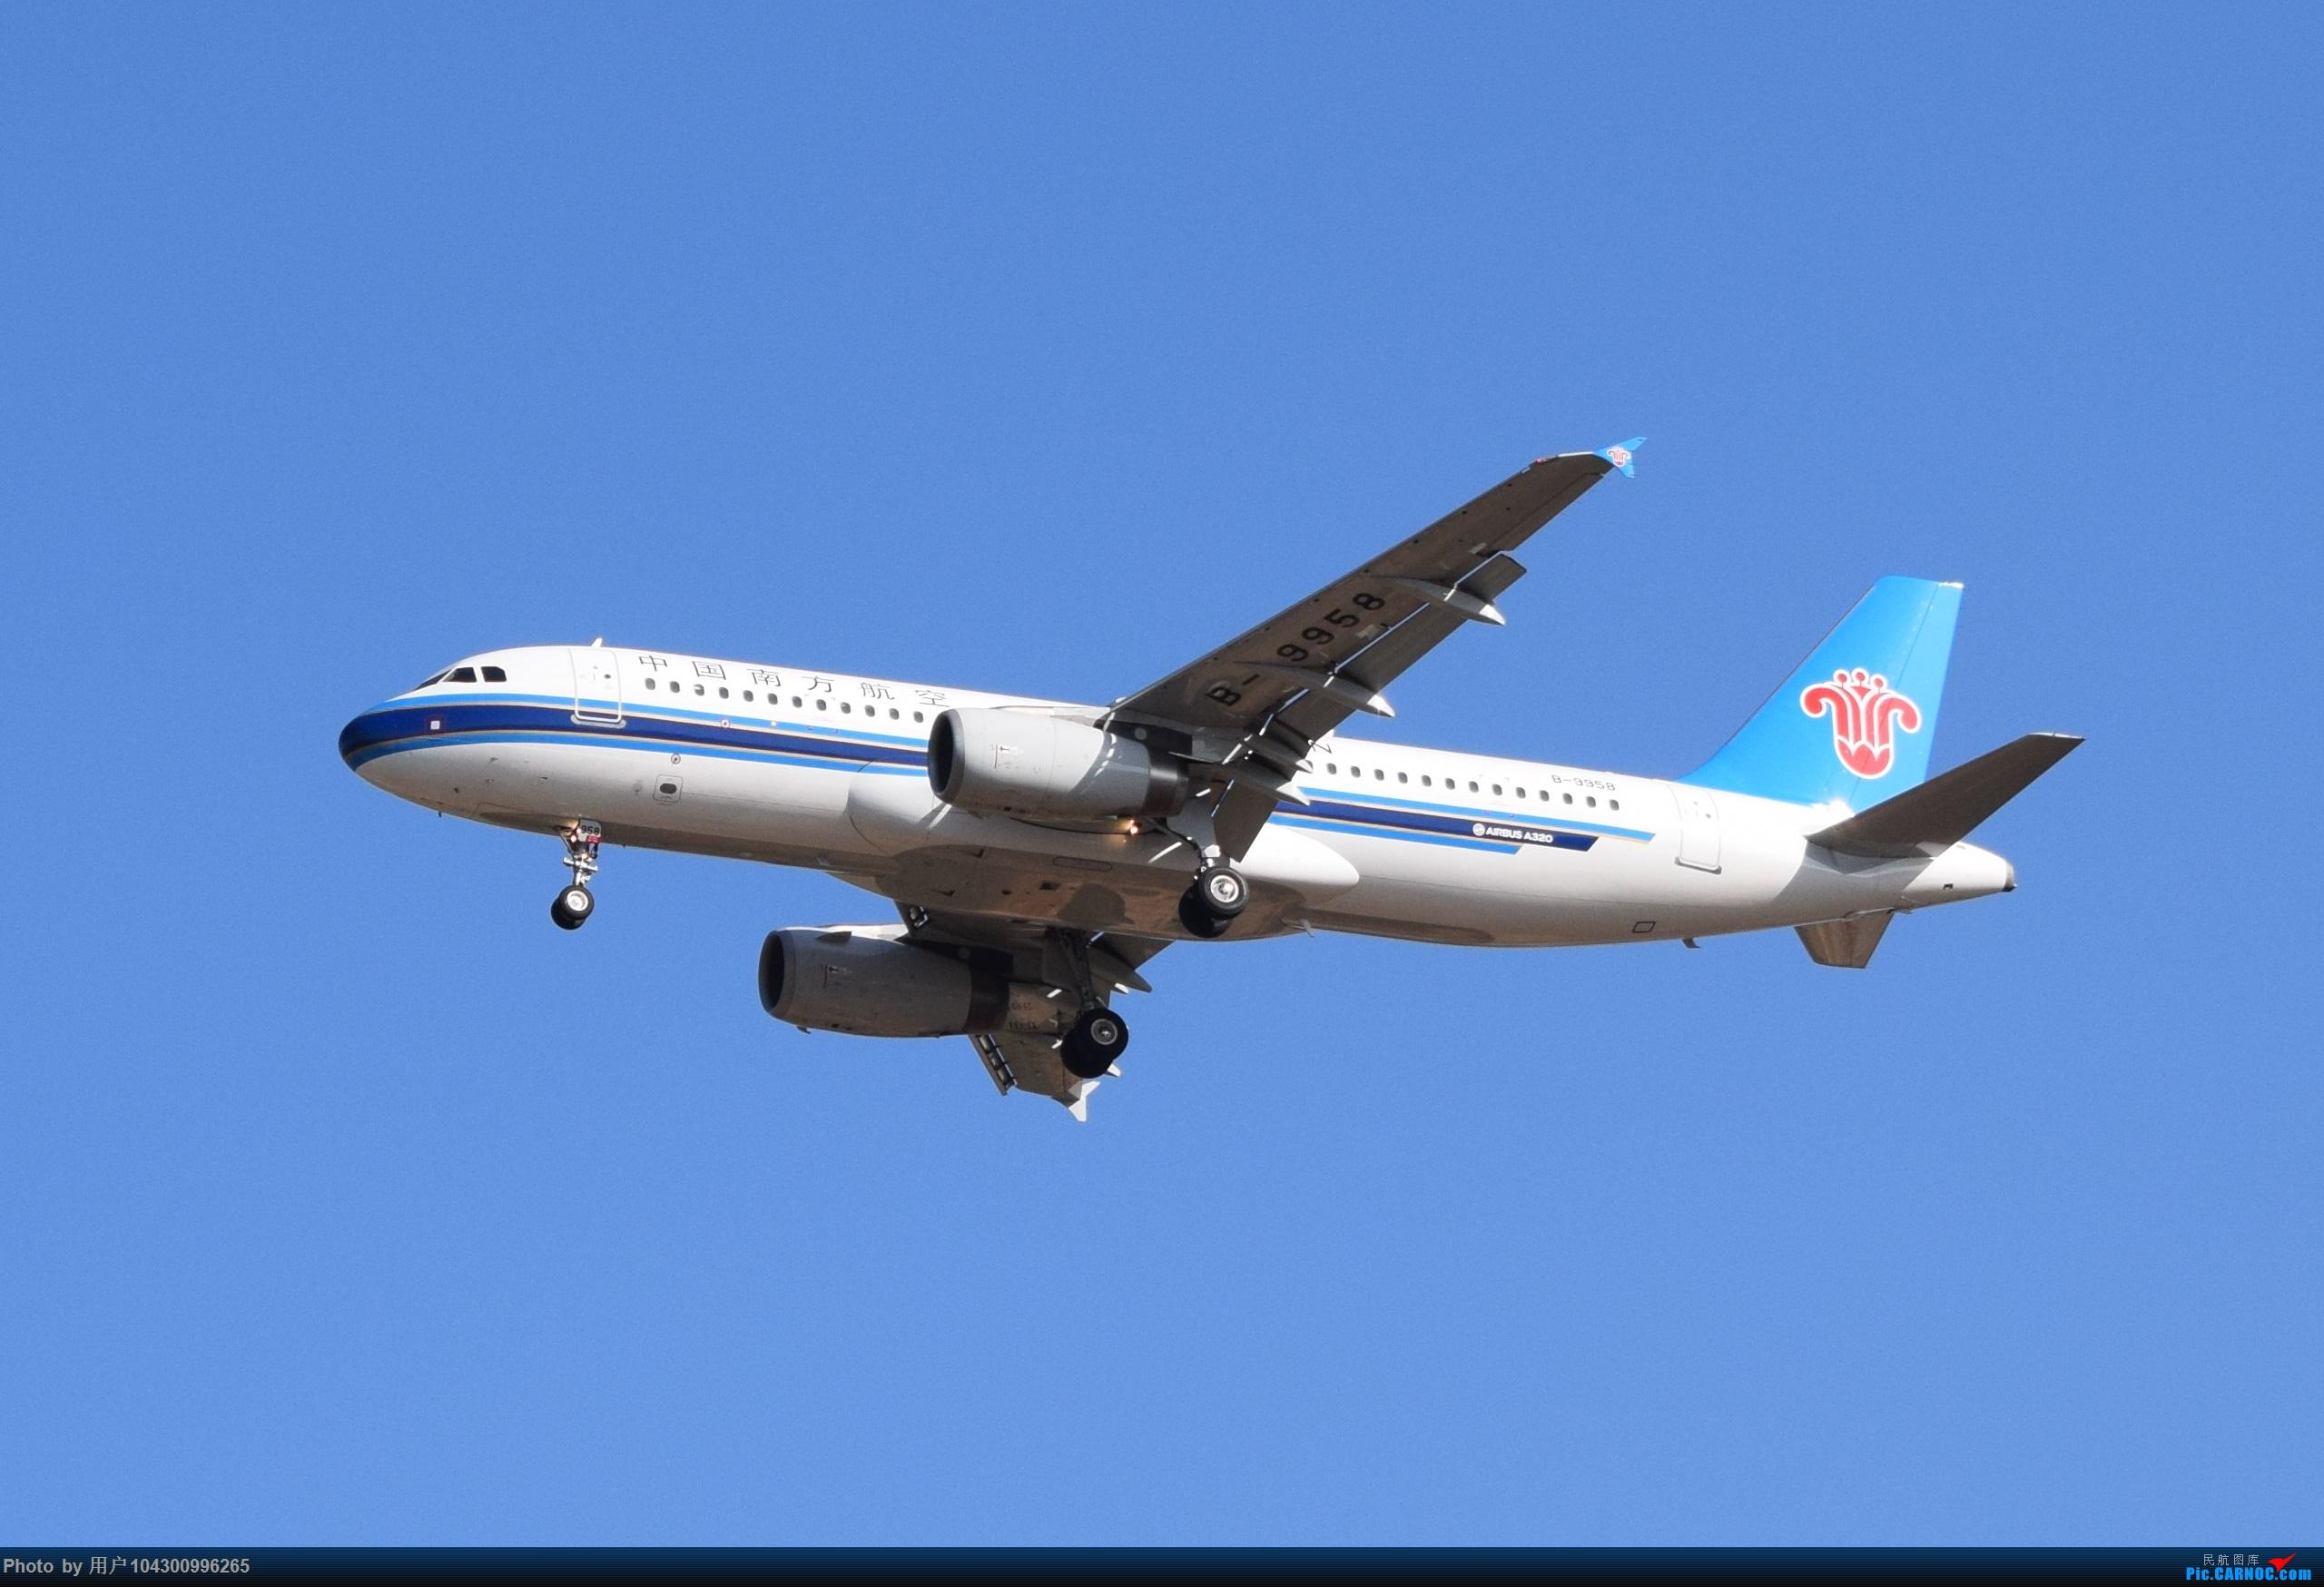 Re:[原创][KWE]贵阳今天天气不错,随便拍几张! AIRBUS A320-200 B-9958 中国贵阳龙洞堡国际机场